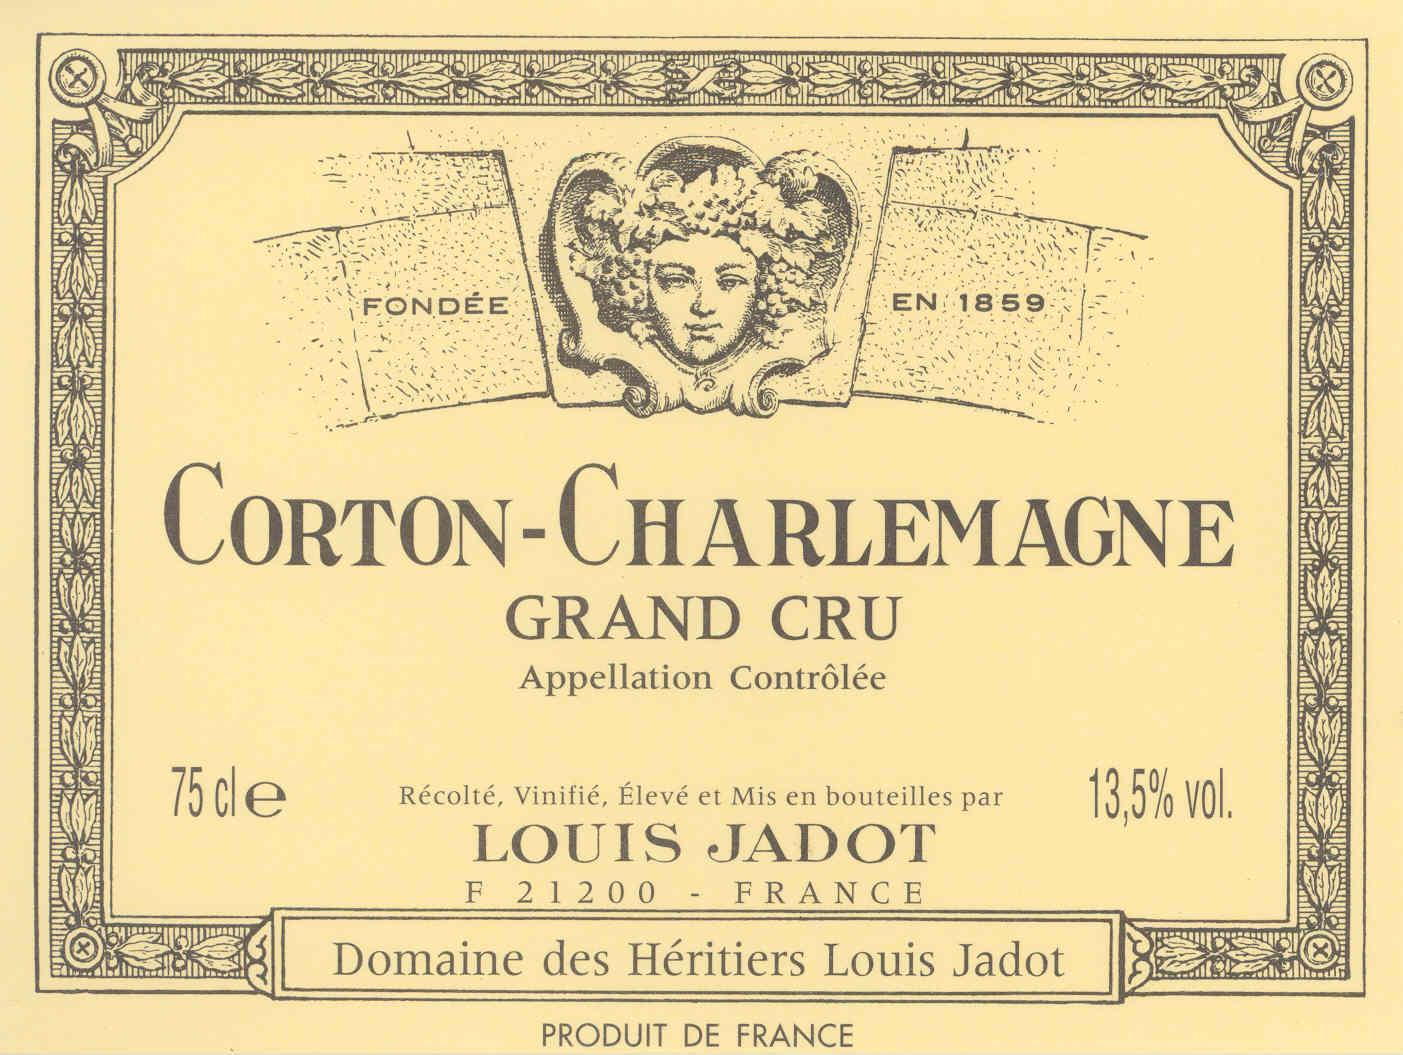 Corton charlemagne original